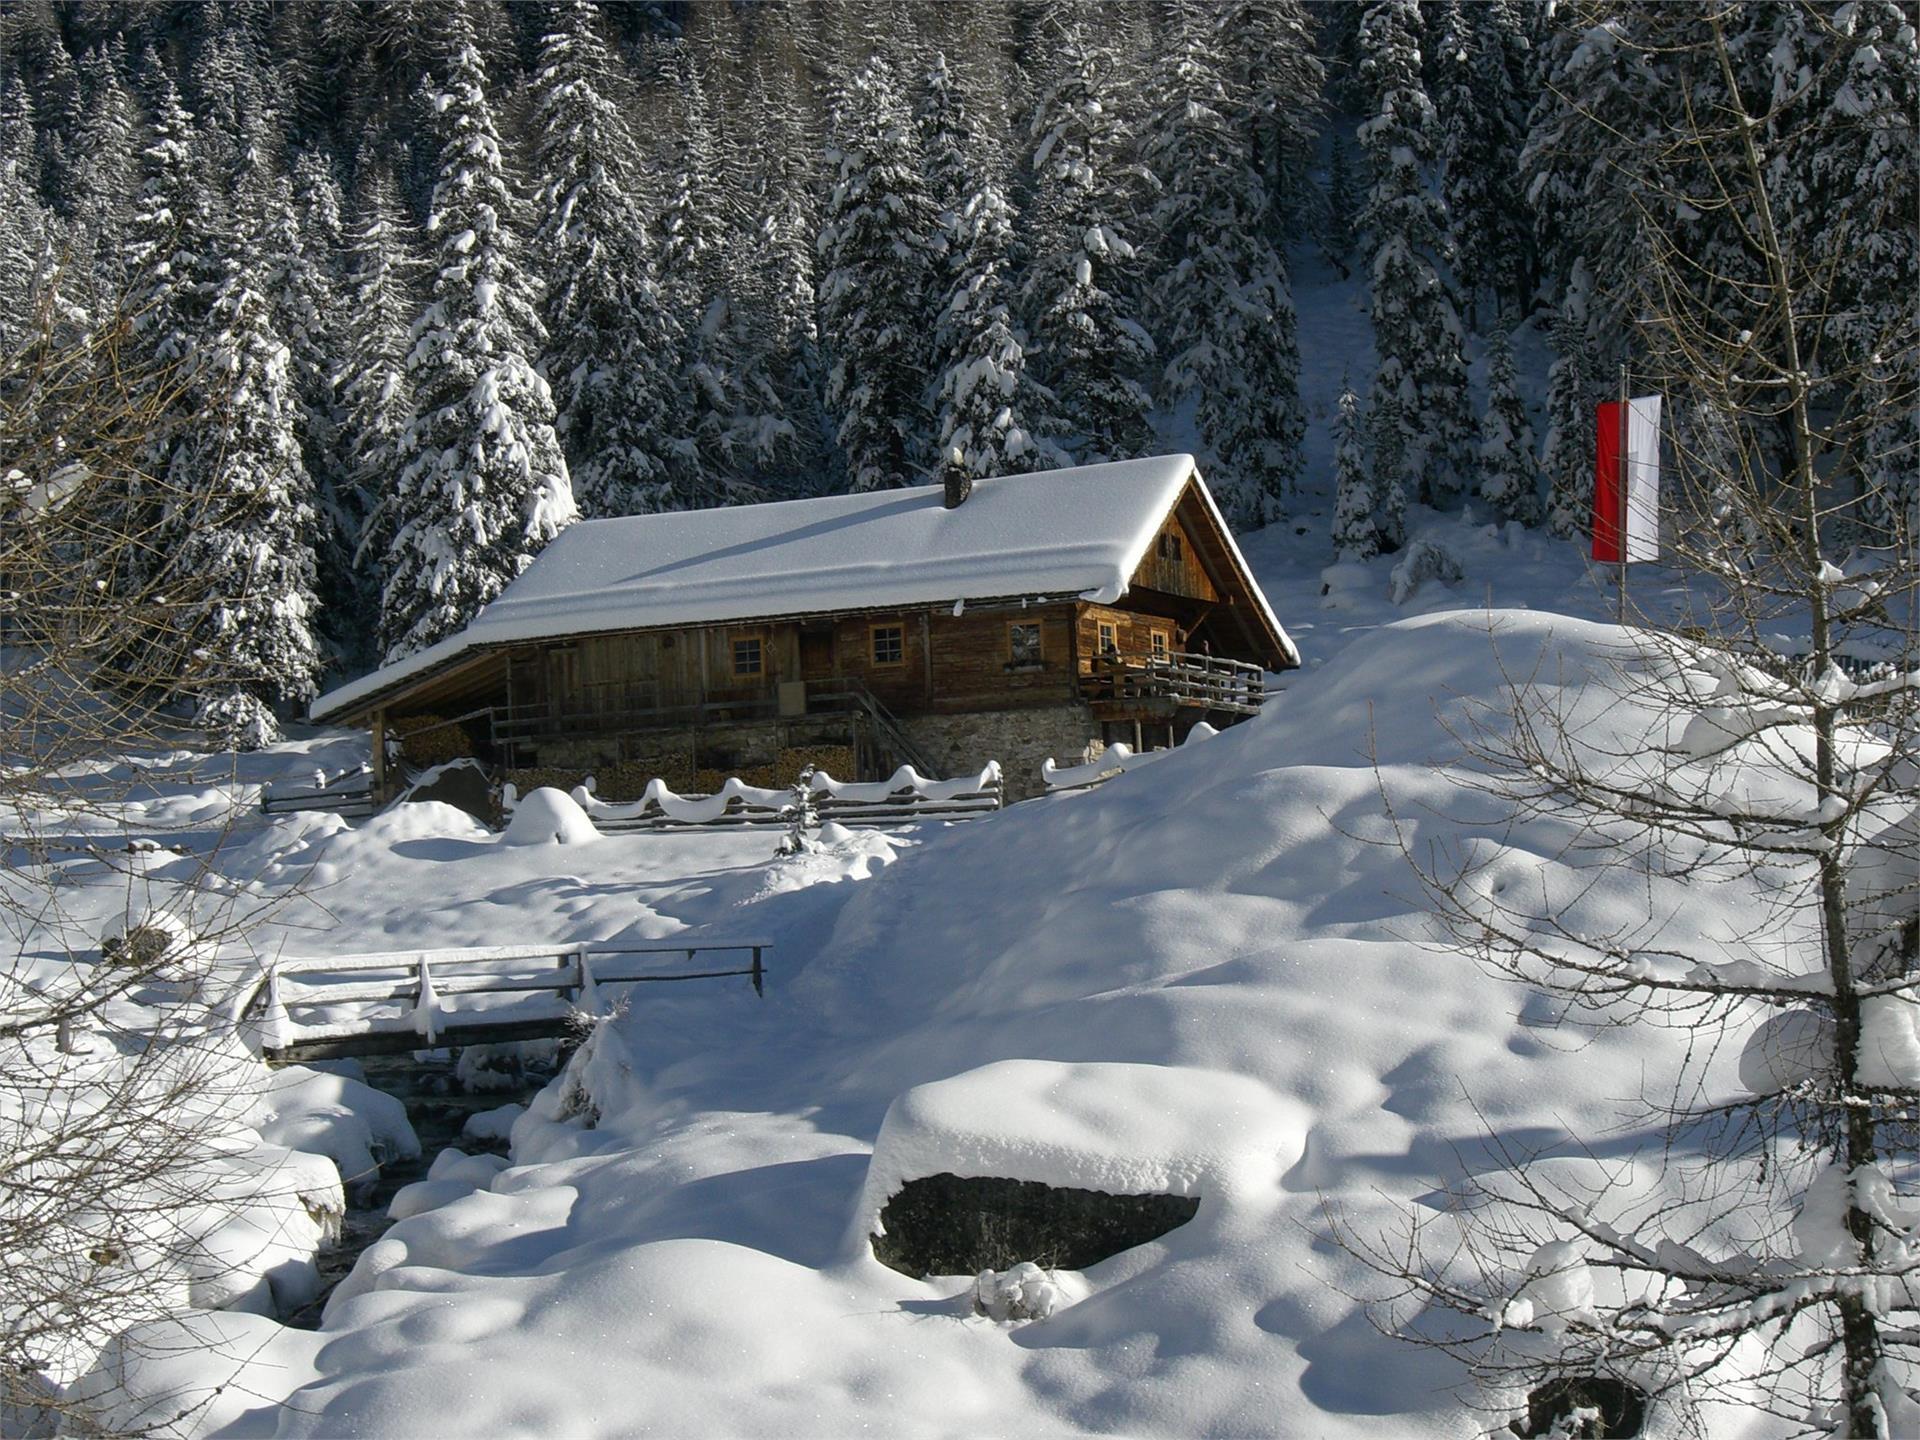 Winter hiking to the Lercher Alp Hut